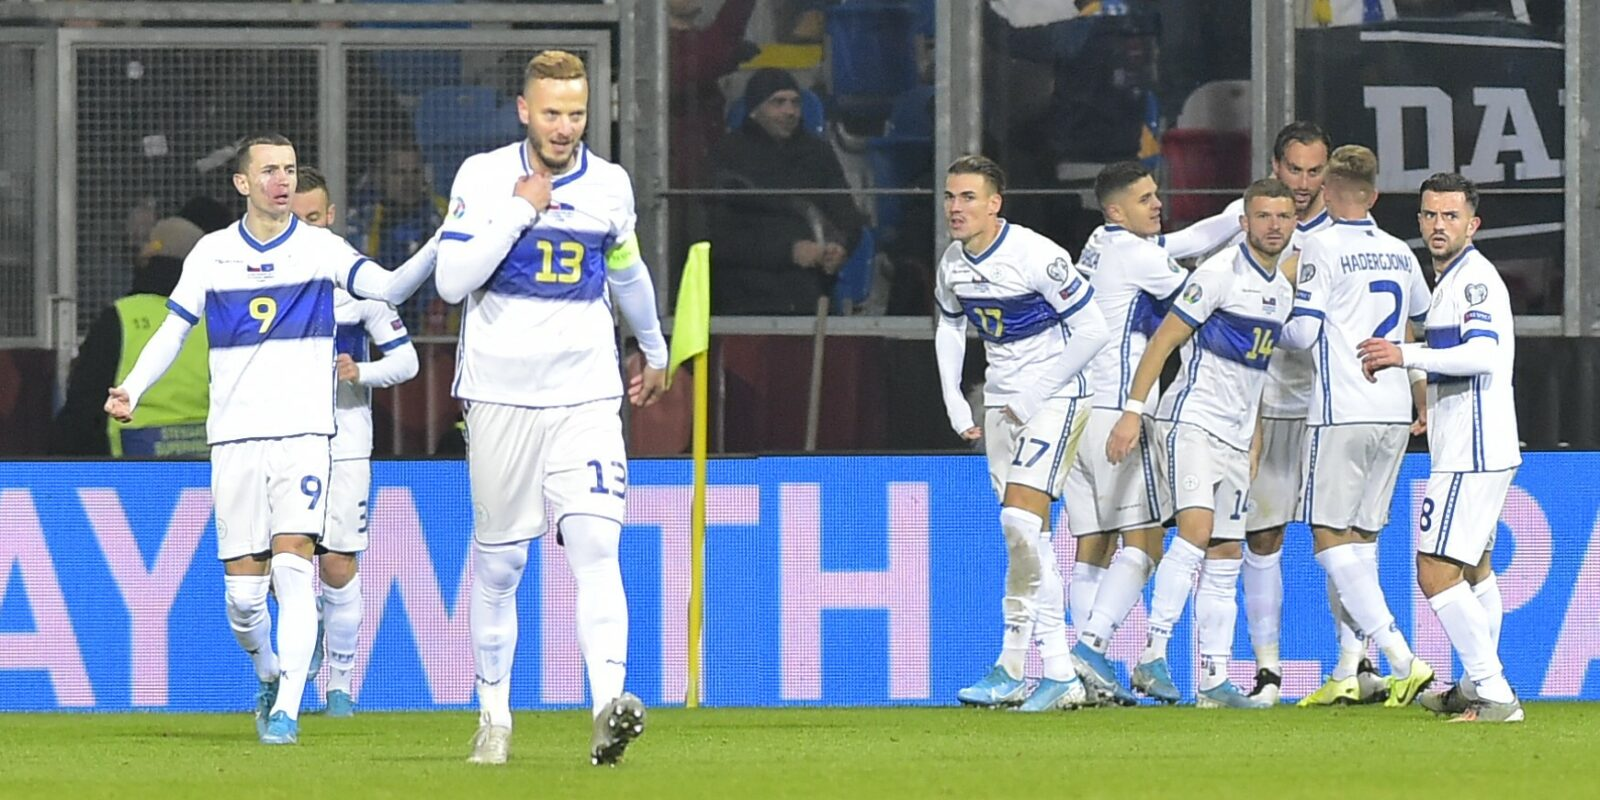 Els jugadors de la selecció de Kosovo celebren un gol | Europa Press   (Foto de ARCHIVO) 14/11/2019 ONLY FOR USE IN SPAIN